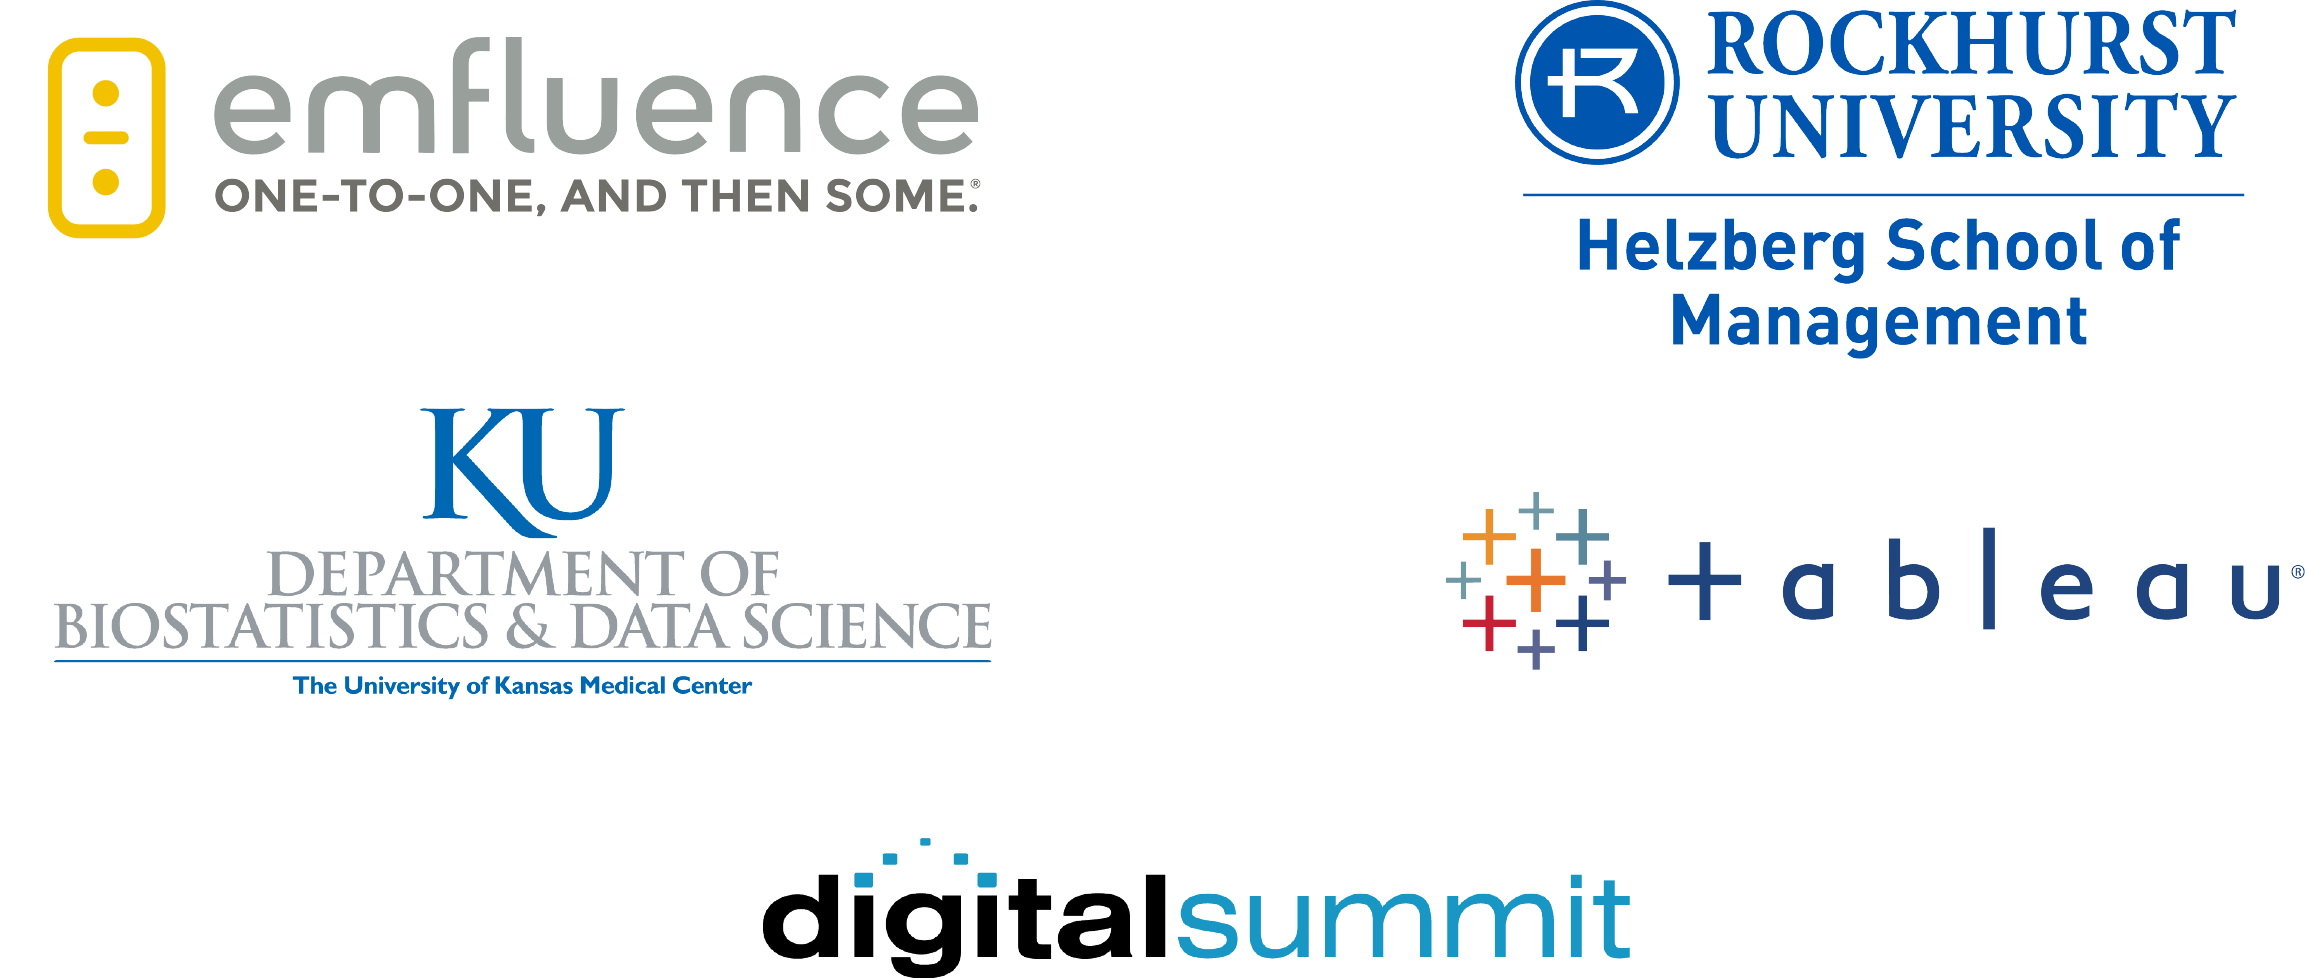 MASS 2019 Sponsors - emfluence, Rockhurst University, University of Kansas, Tableau, Digital Summit